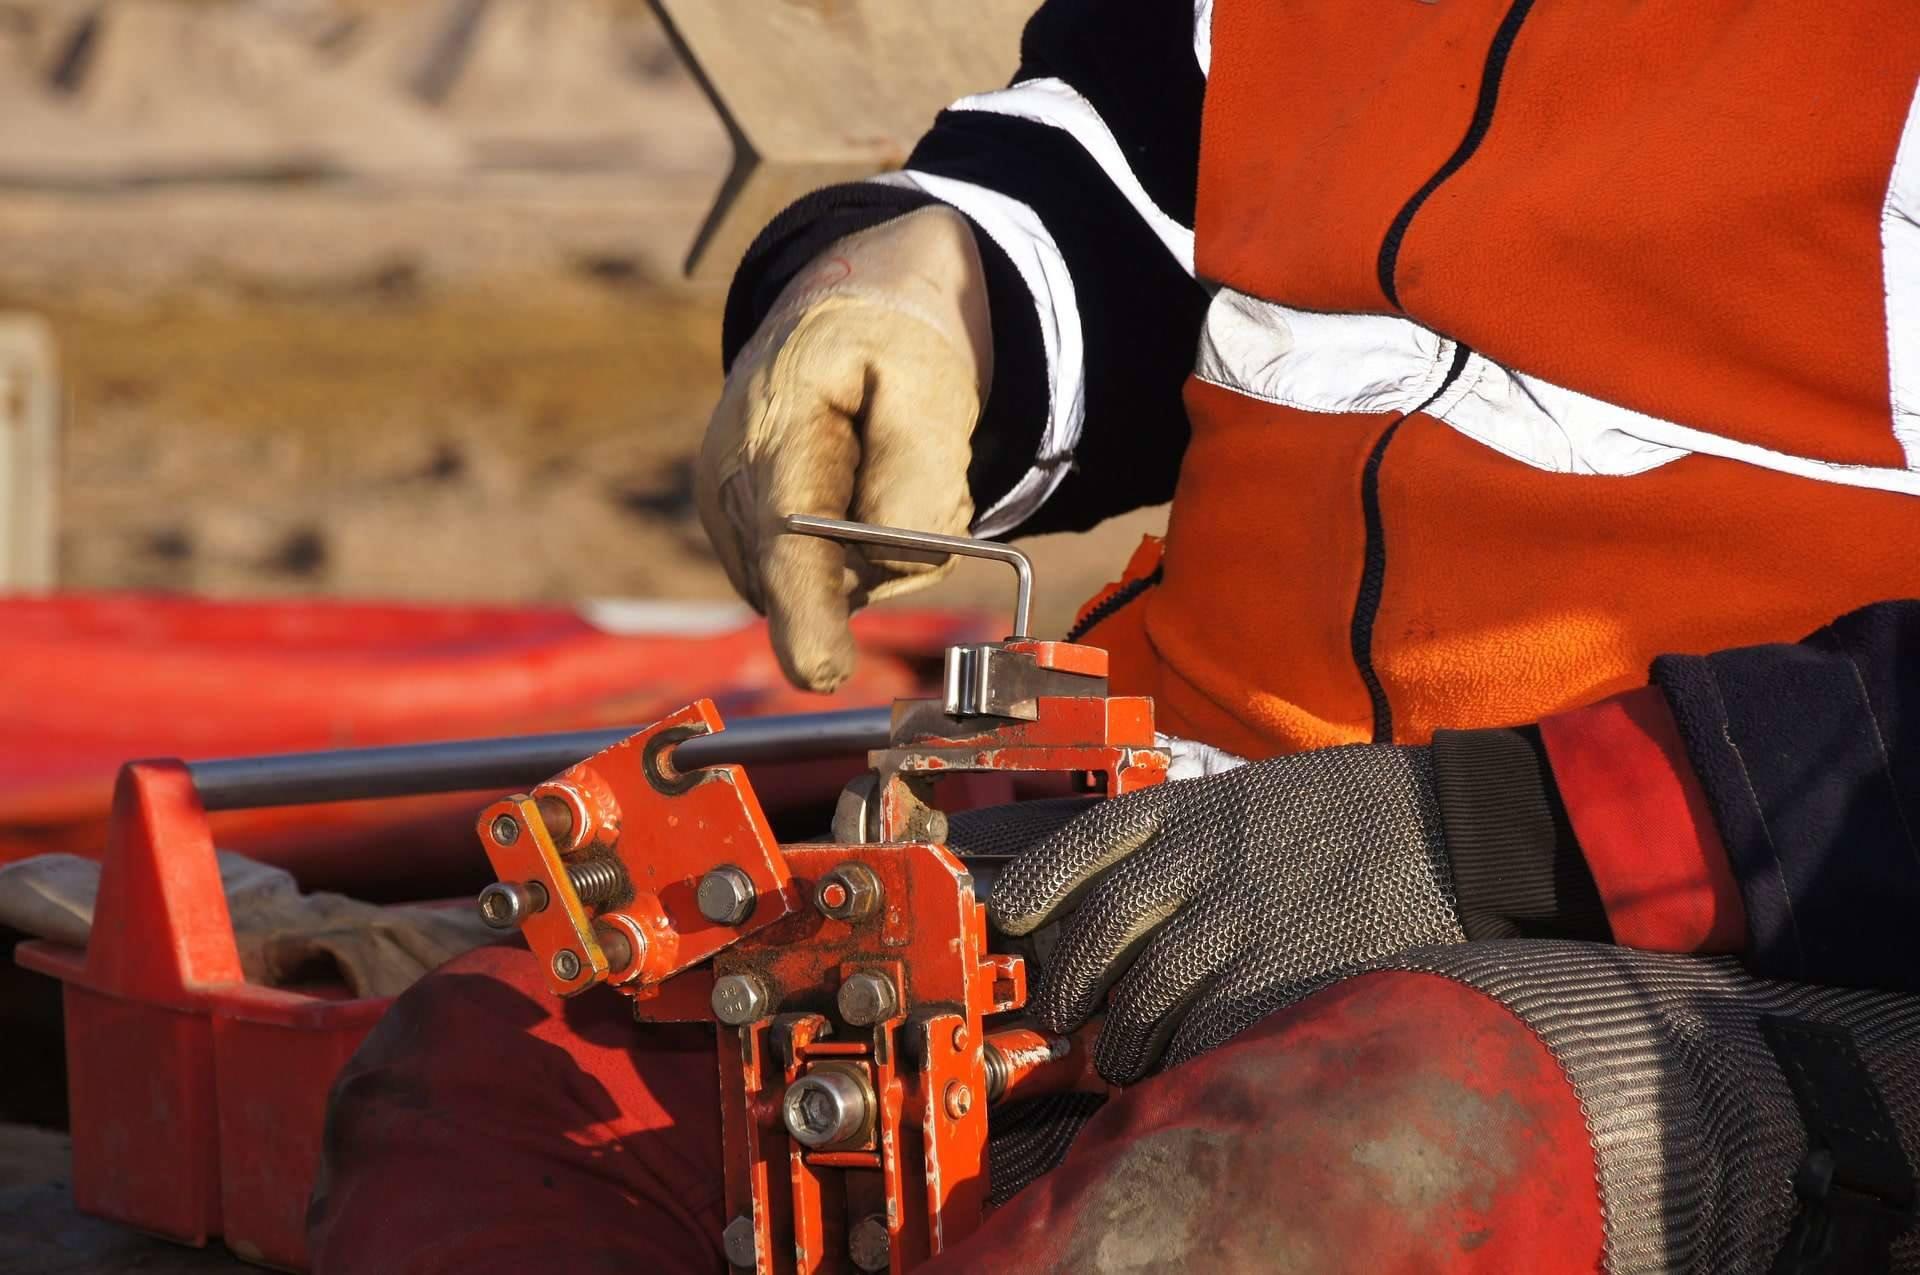 Worker machinery Allen key